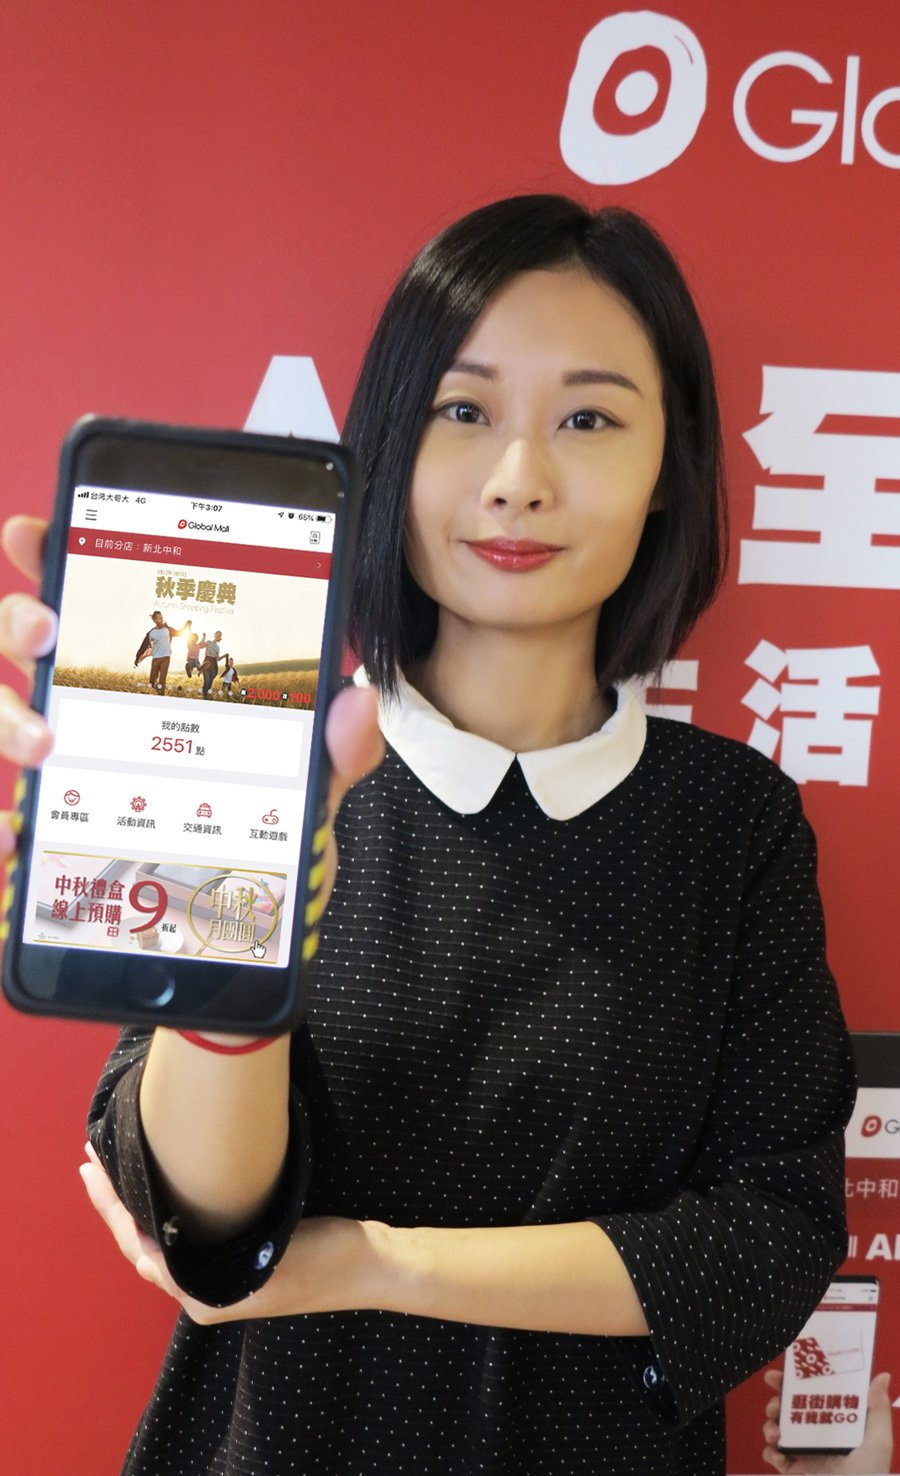 Global Mall APP全新改版,首創百貨APP四大功能,包括車牌綁定停車...